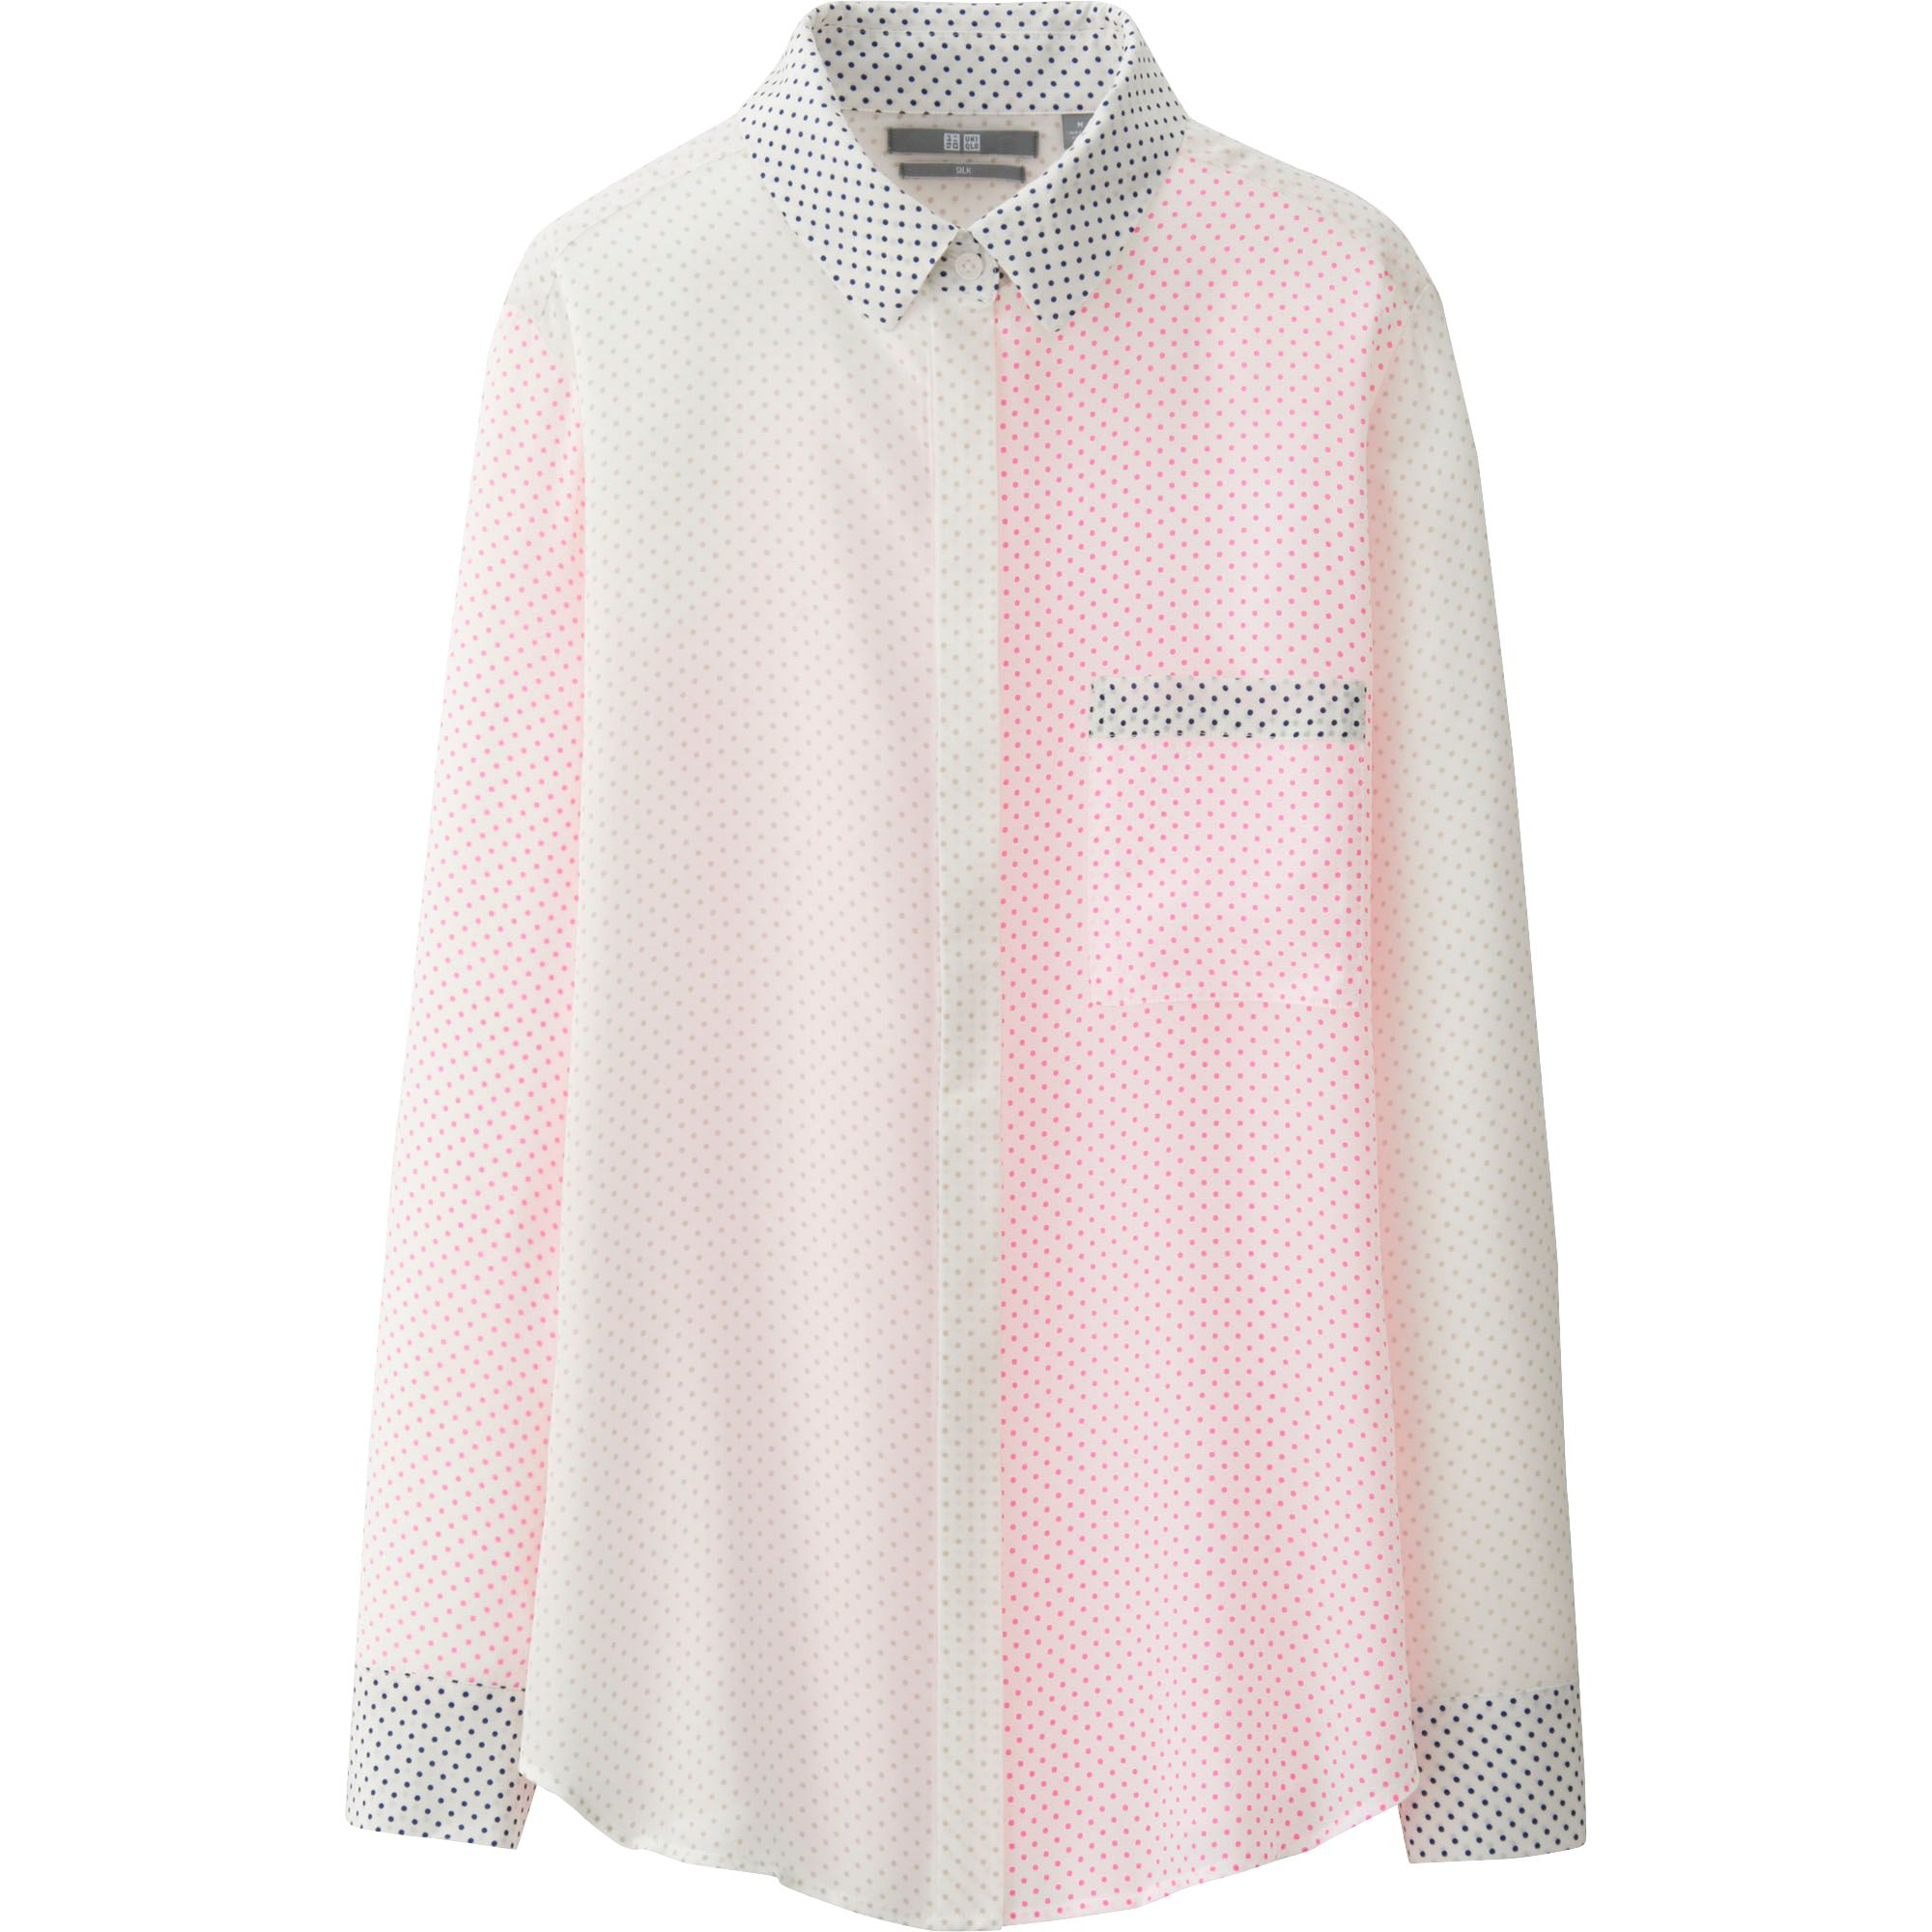 Women'S Pink Long Sleeve Blouse 8